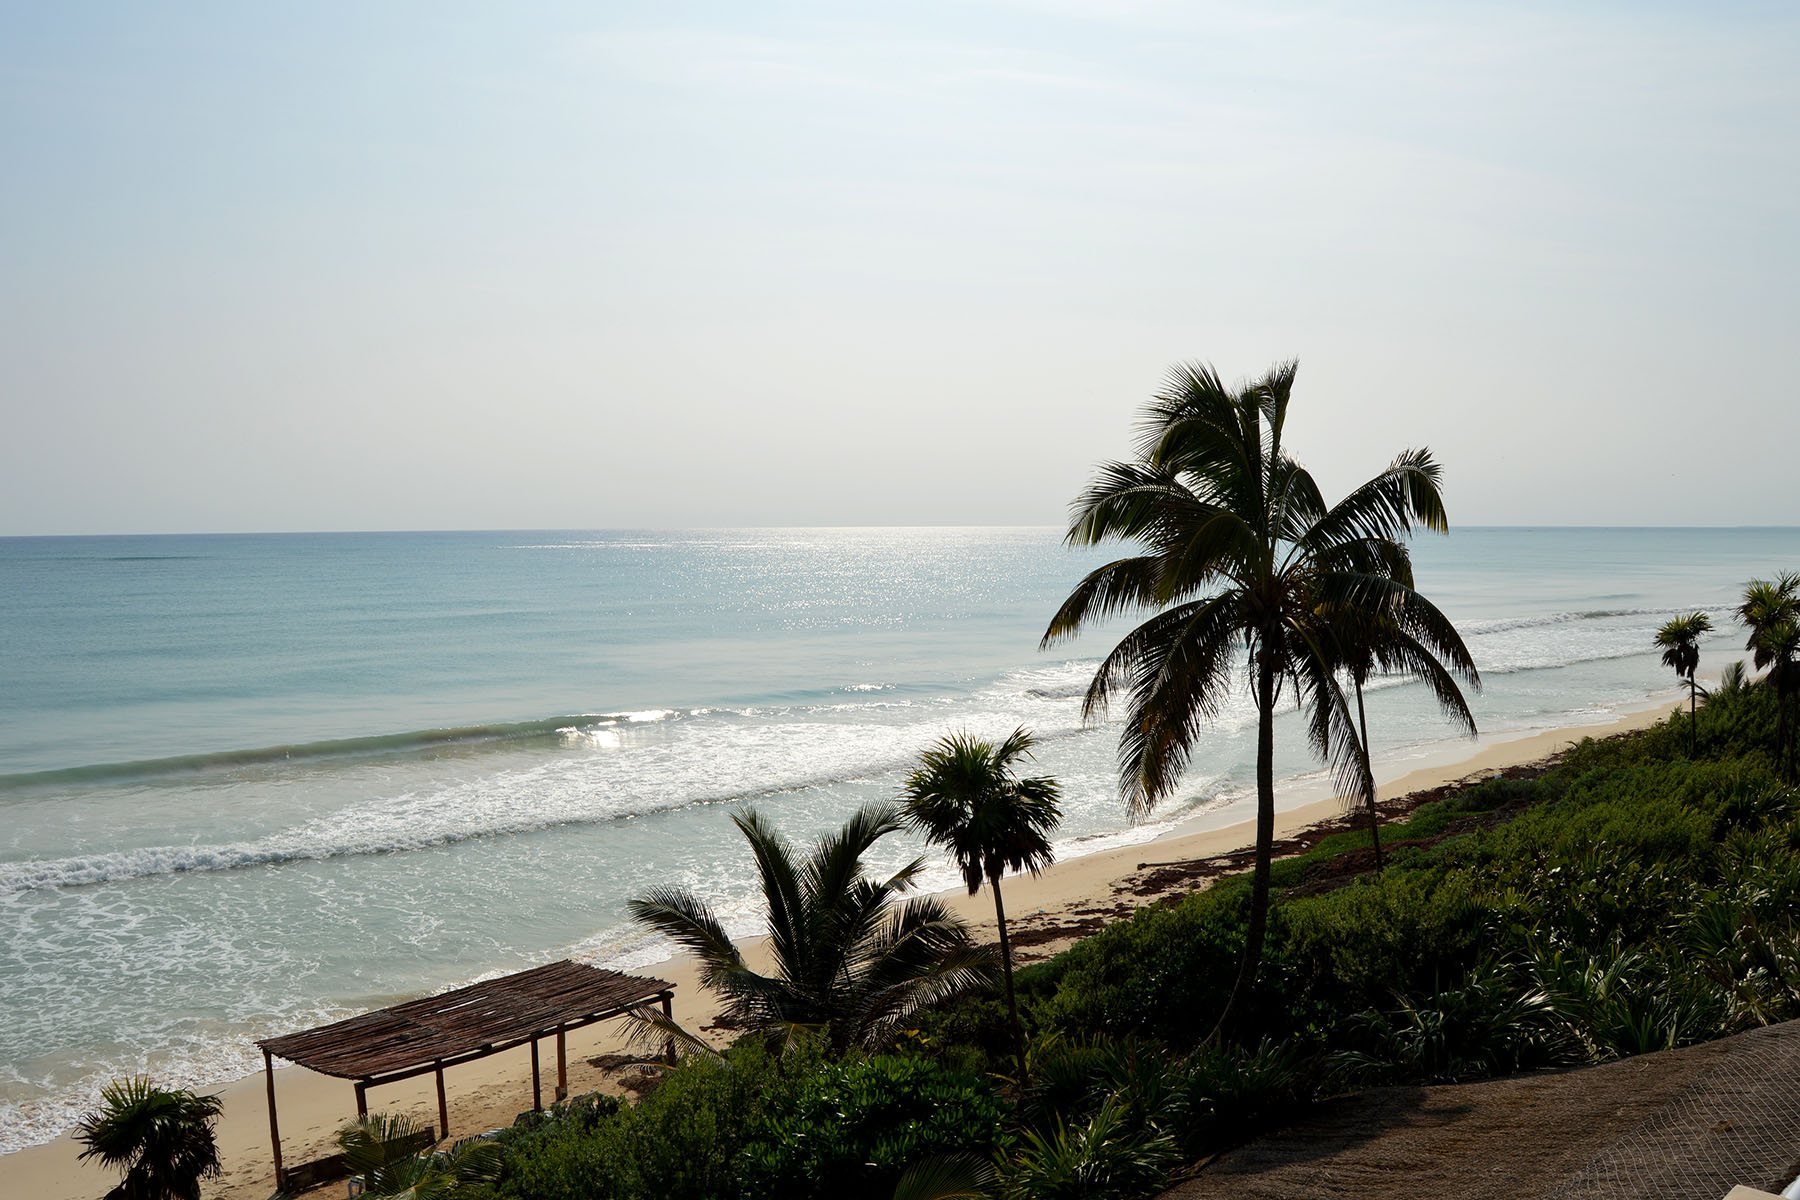 Additional photo for property listing at PARADISIACAL DOS AGUAS VILLA Sian Ka'an Biosphere Reserve Camino Tulum - Boca Paila Calle Paseo del Muerto Playa Del Carmen, Quintana Roo 77738 Mexico